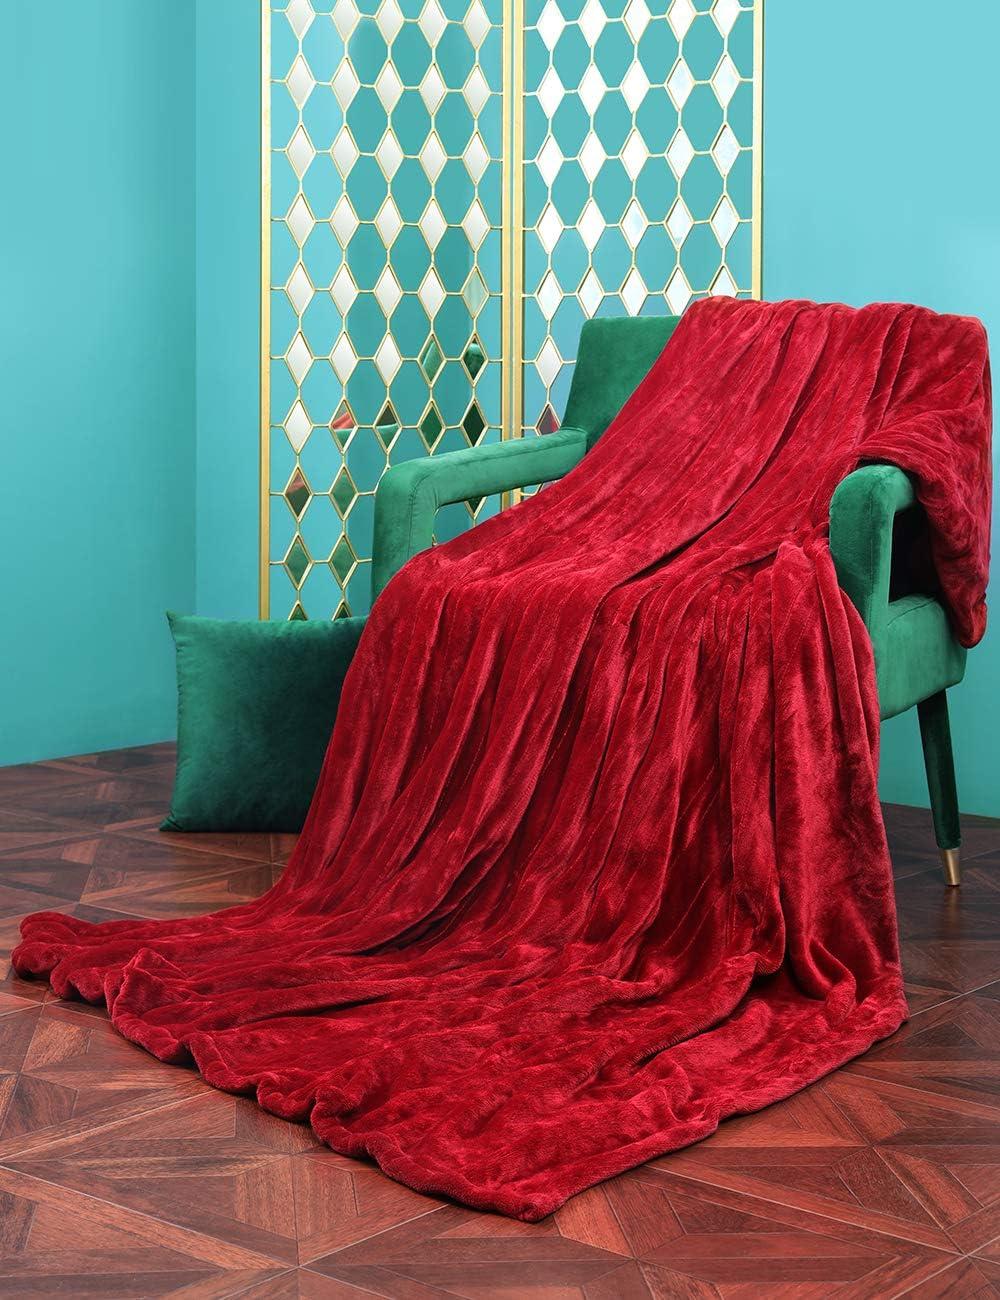 Sable Heated Blankets